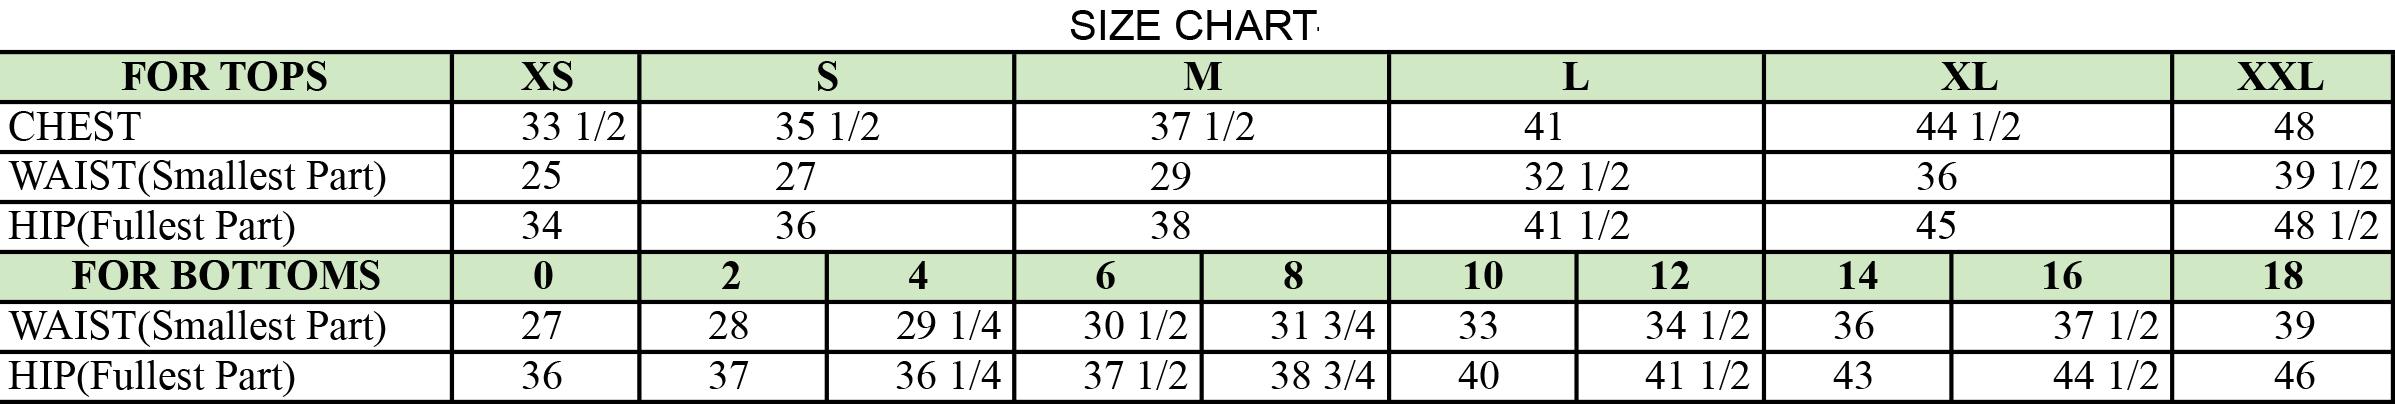 size-chart2.jpg